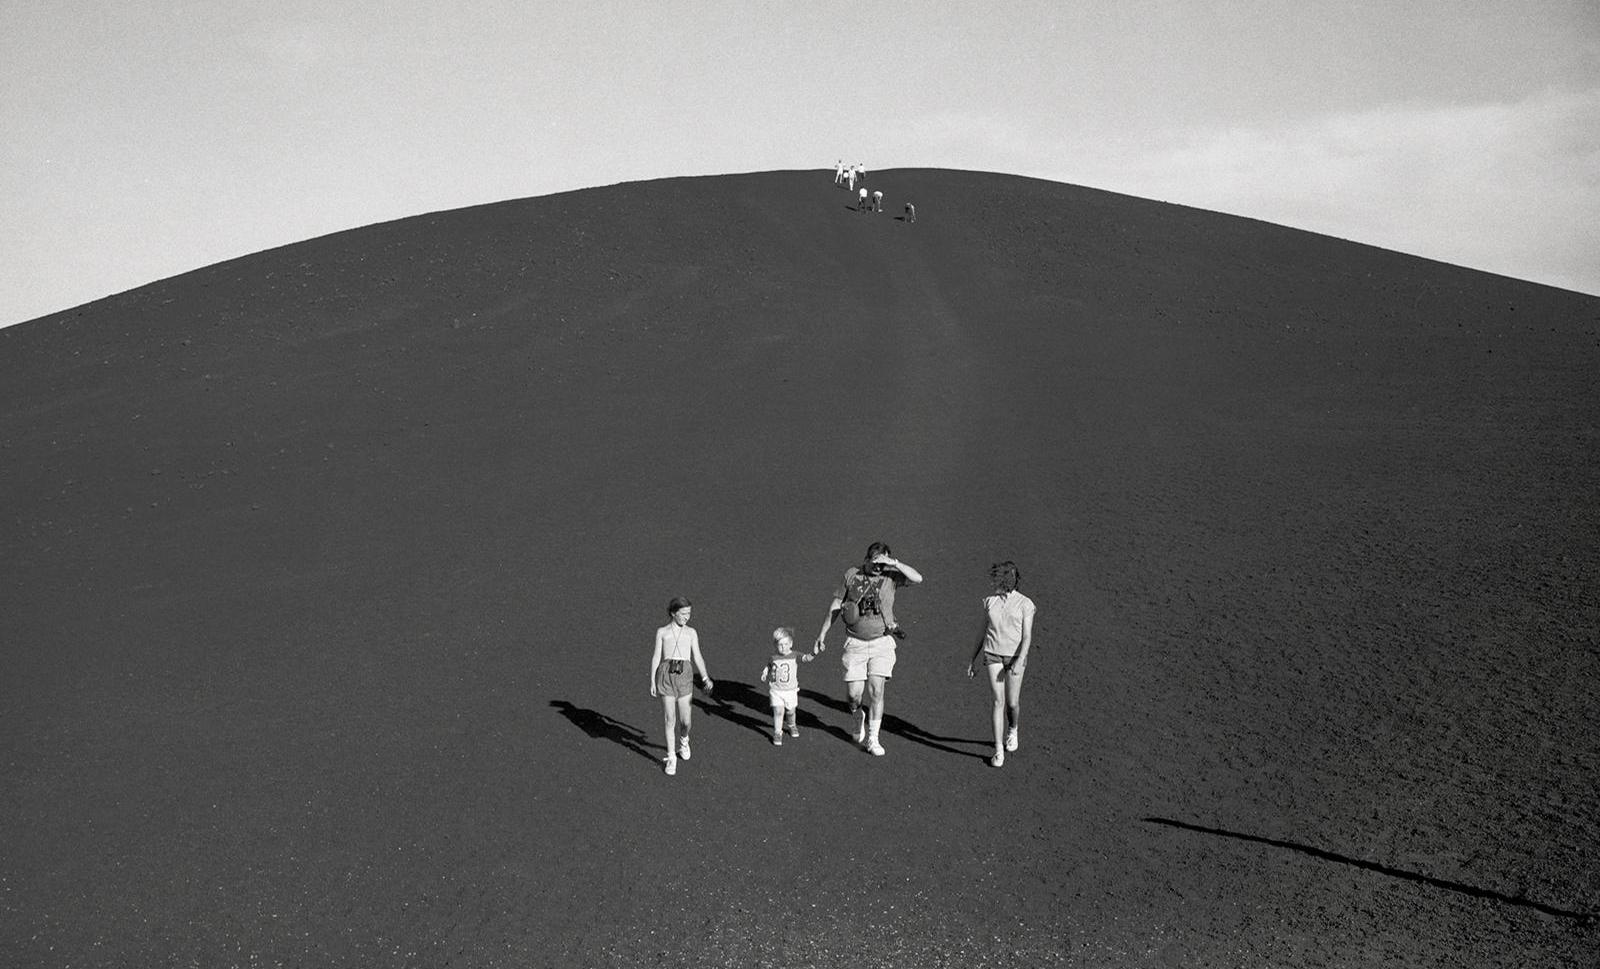 Ingeborg Gerdes, Craters of the Moon, Idaho, 1988.